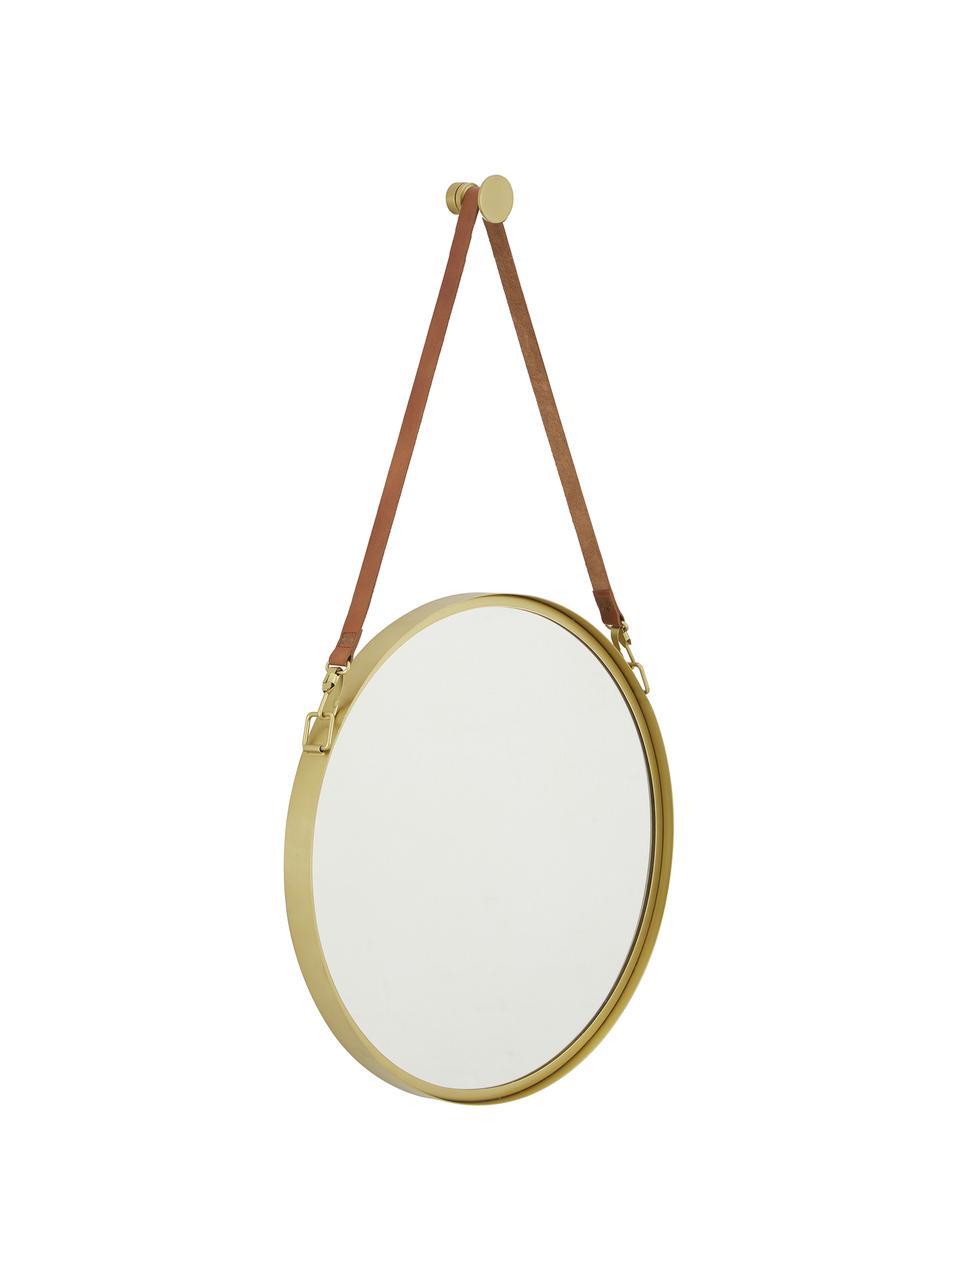 Miroir mural rond doré Liz, Or